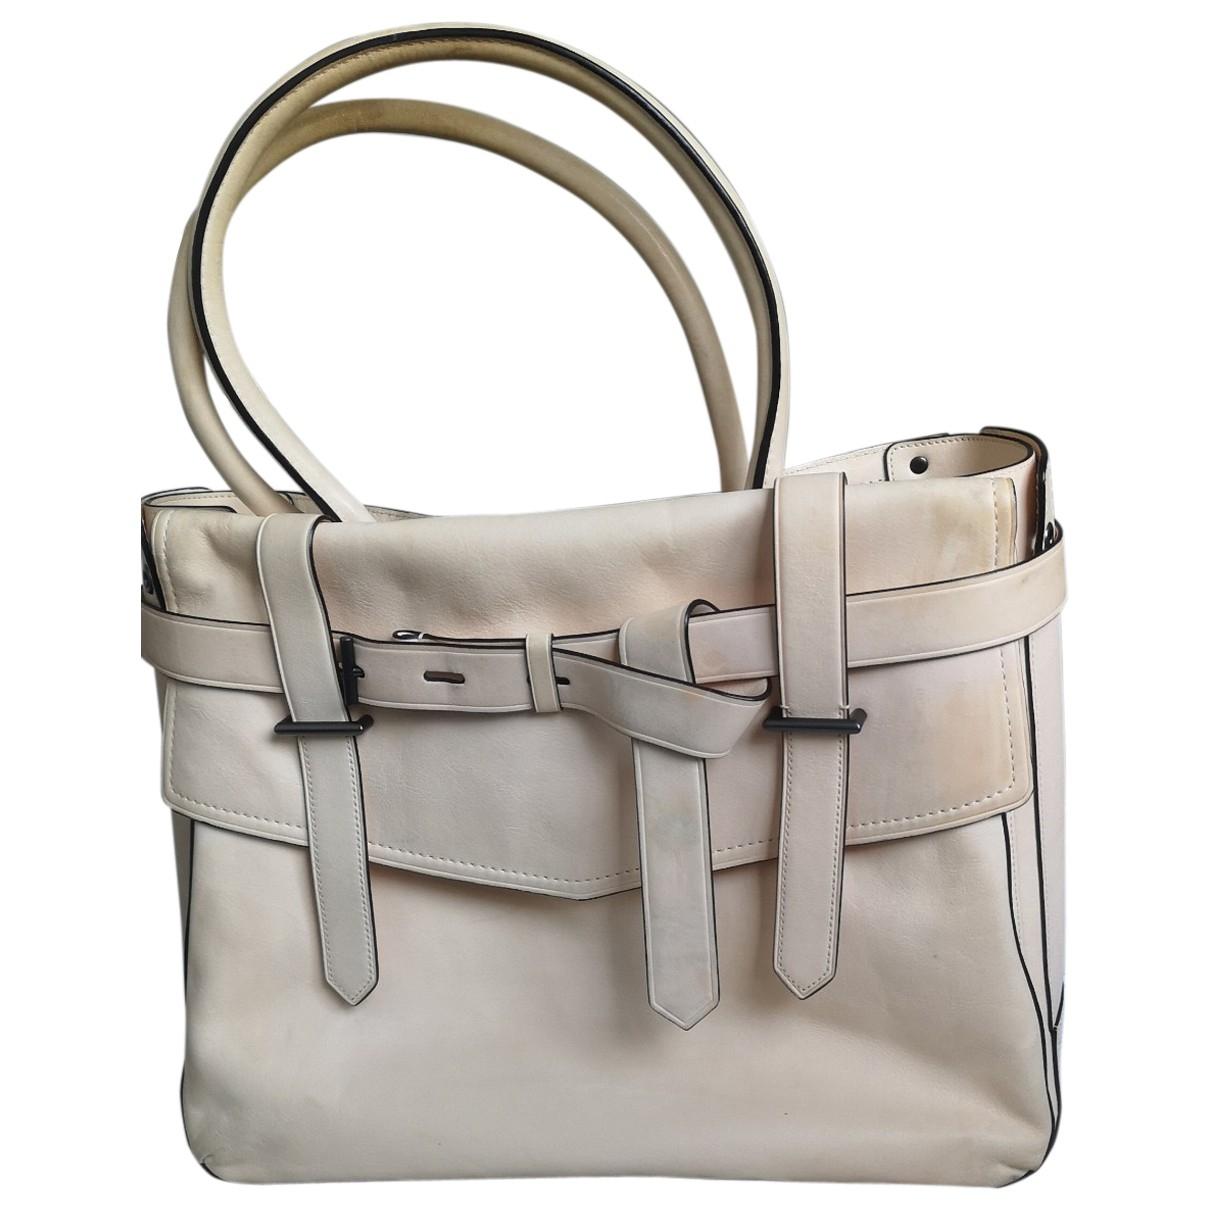 Reed Krakoff \N Handtasche in  Beige Leder